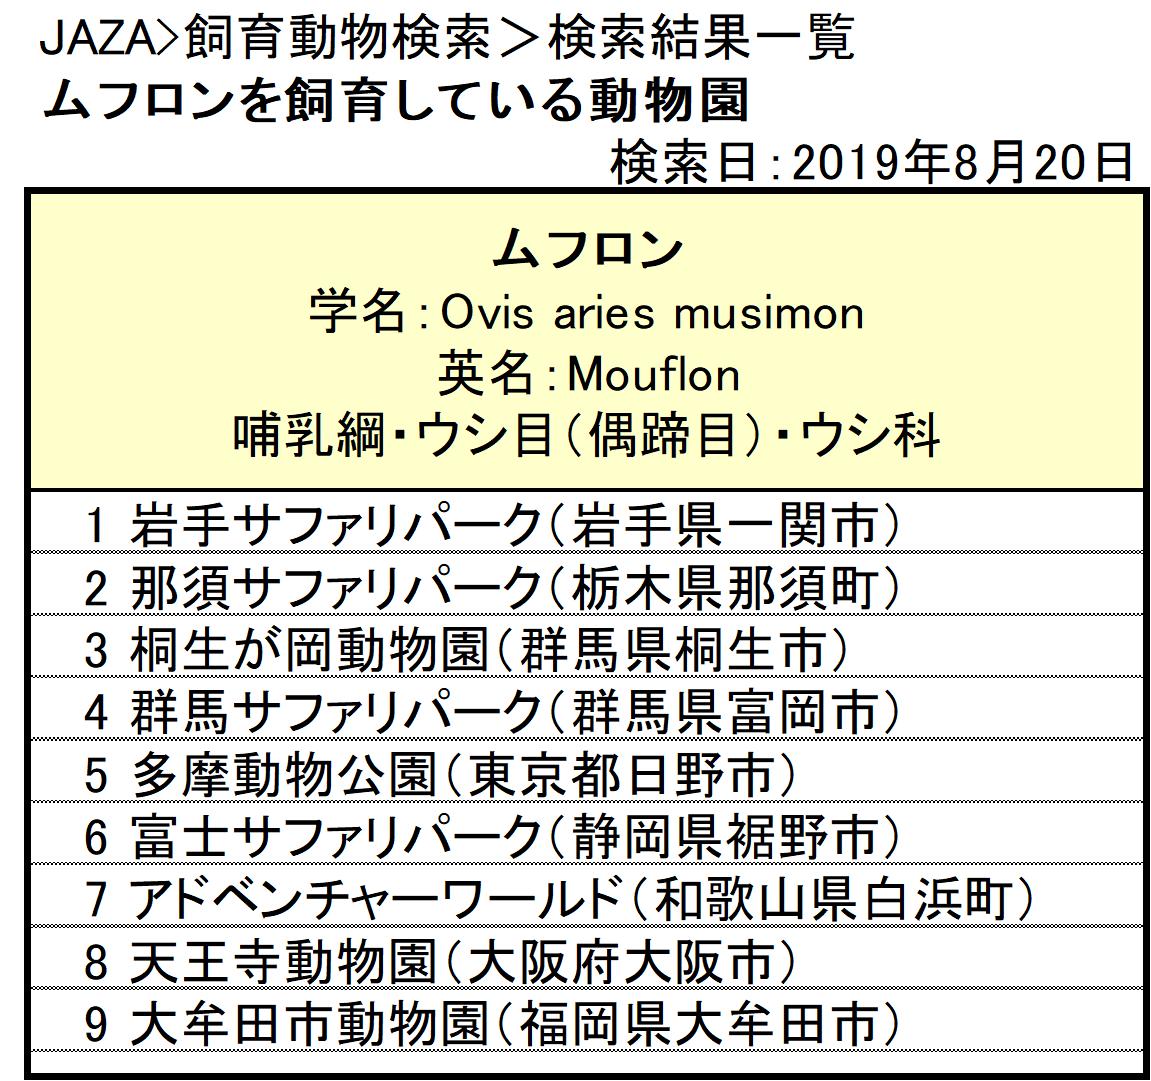 f:id:tsukunepapa:20190820072325p:plain